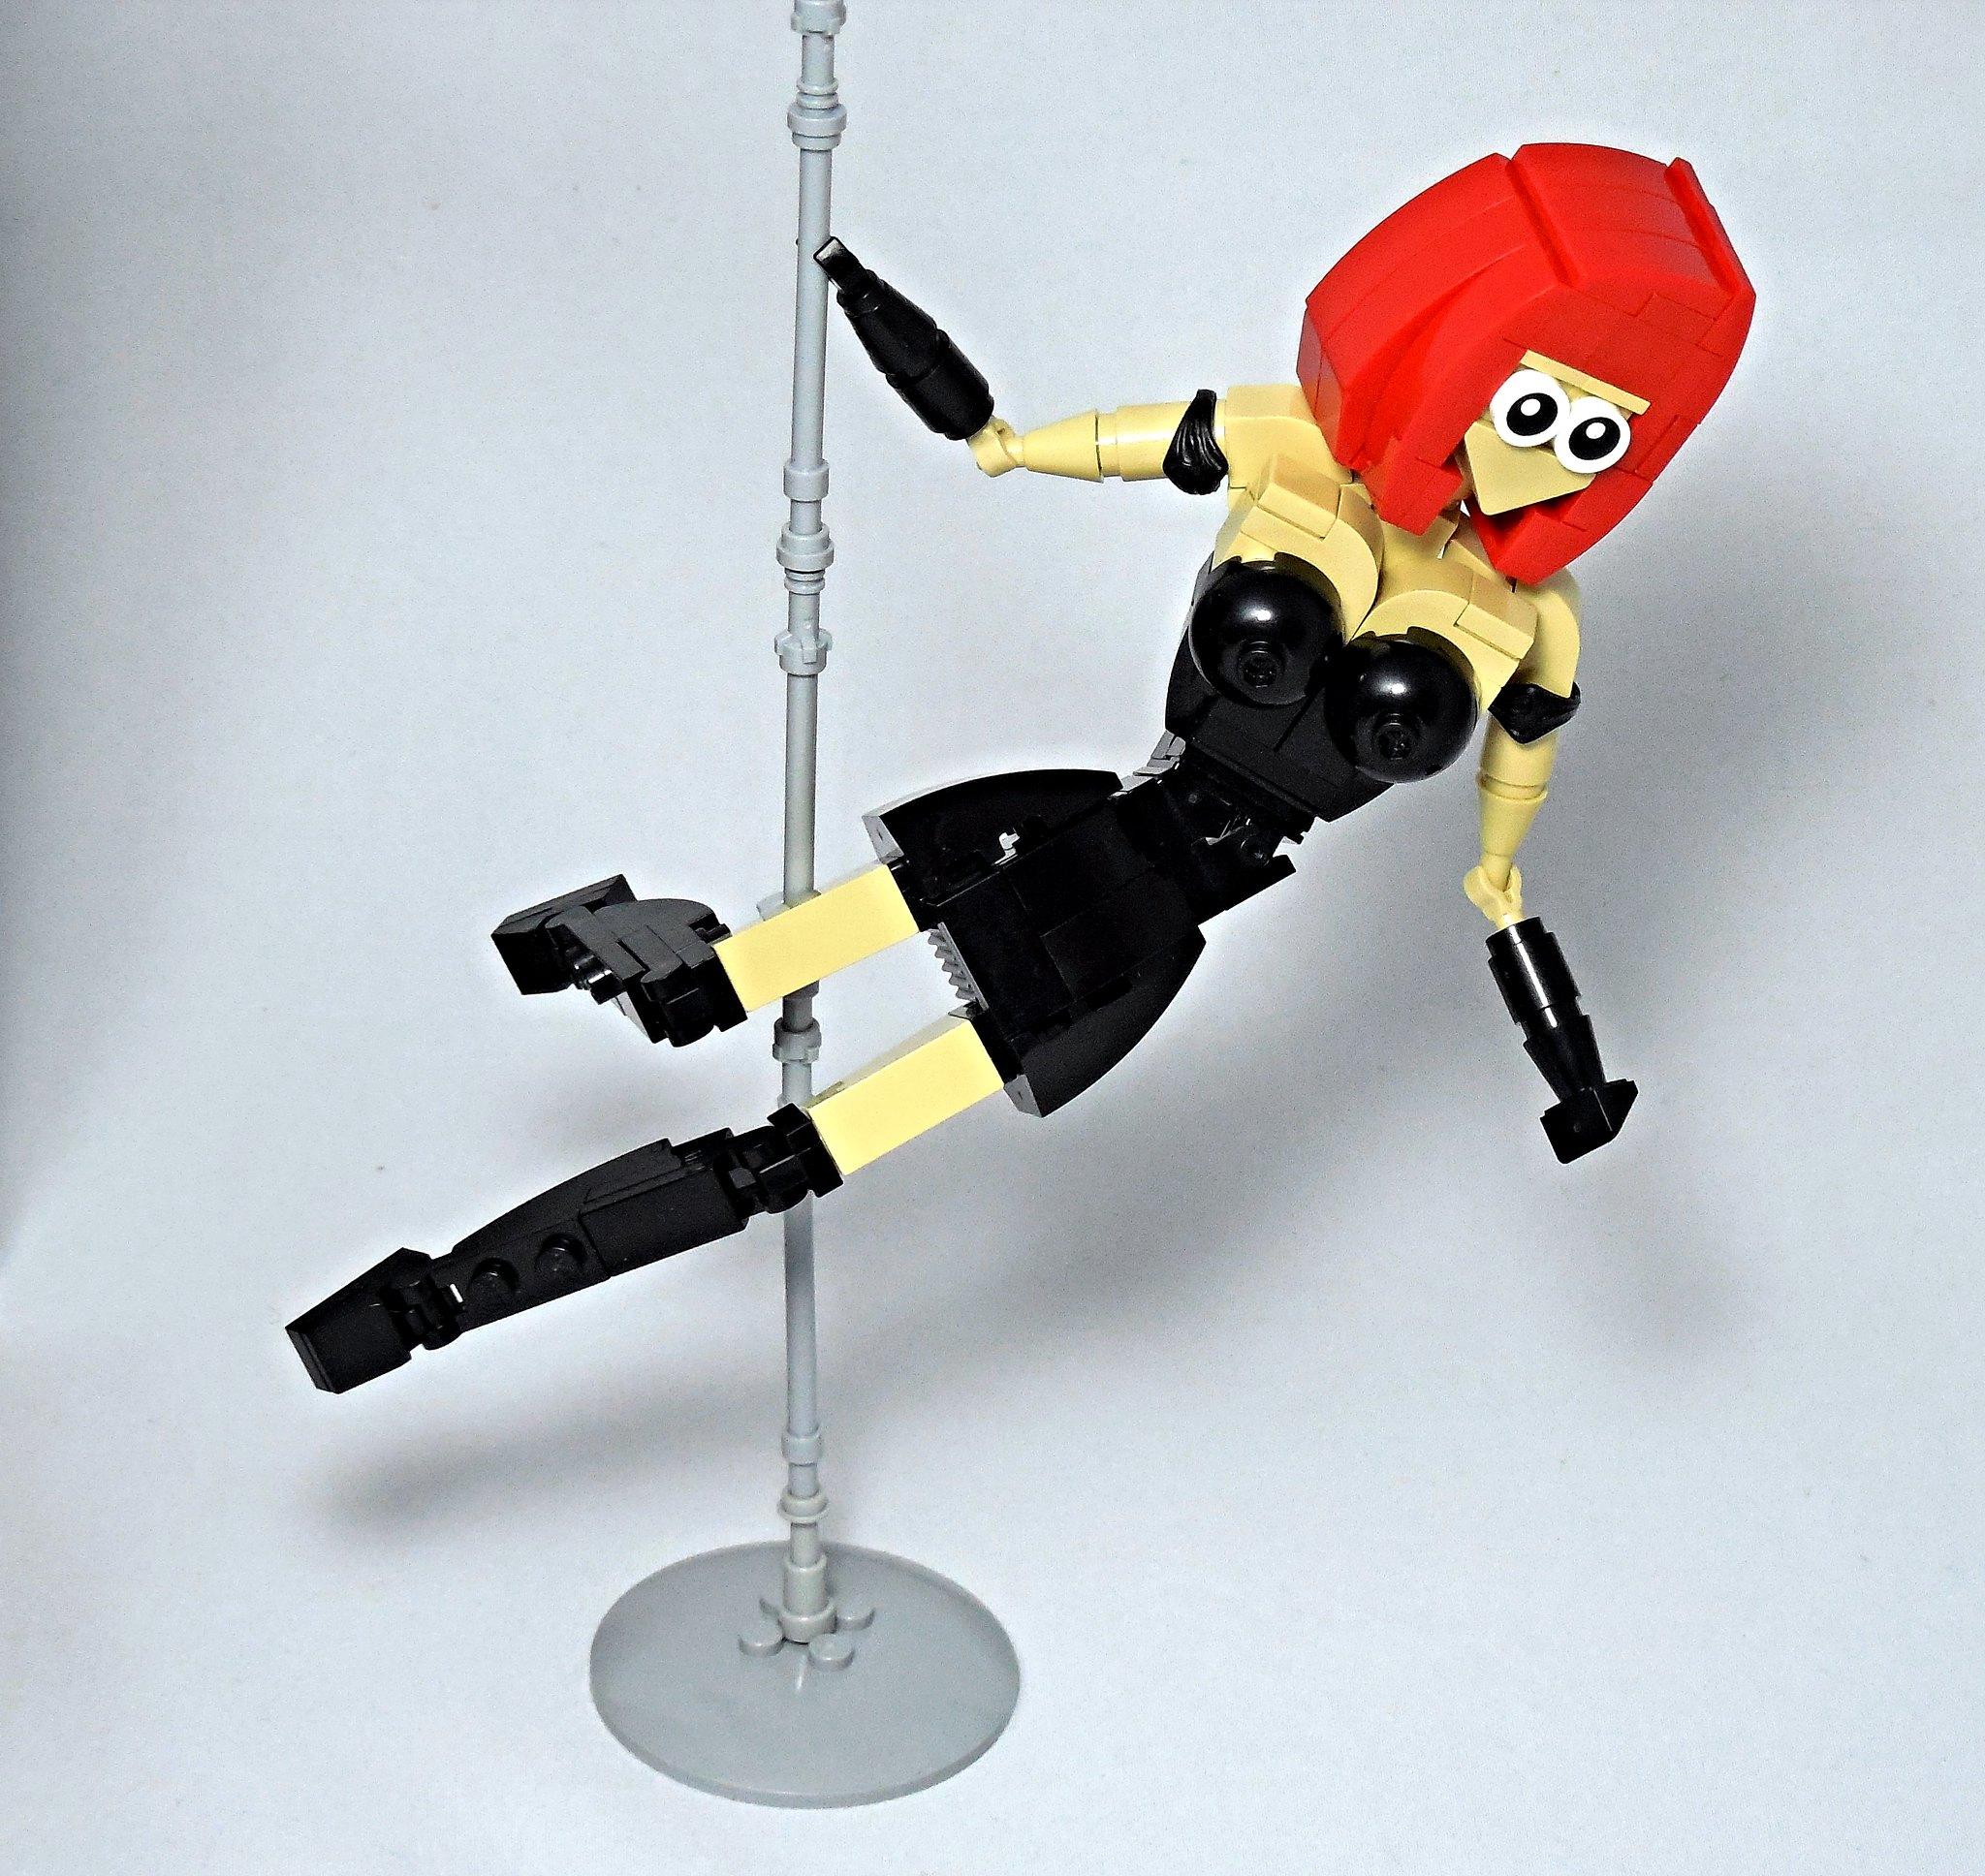 LEGO® MOC by Vitreolum: Pole Dancer